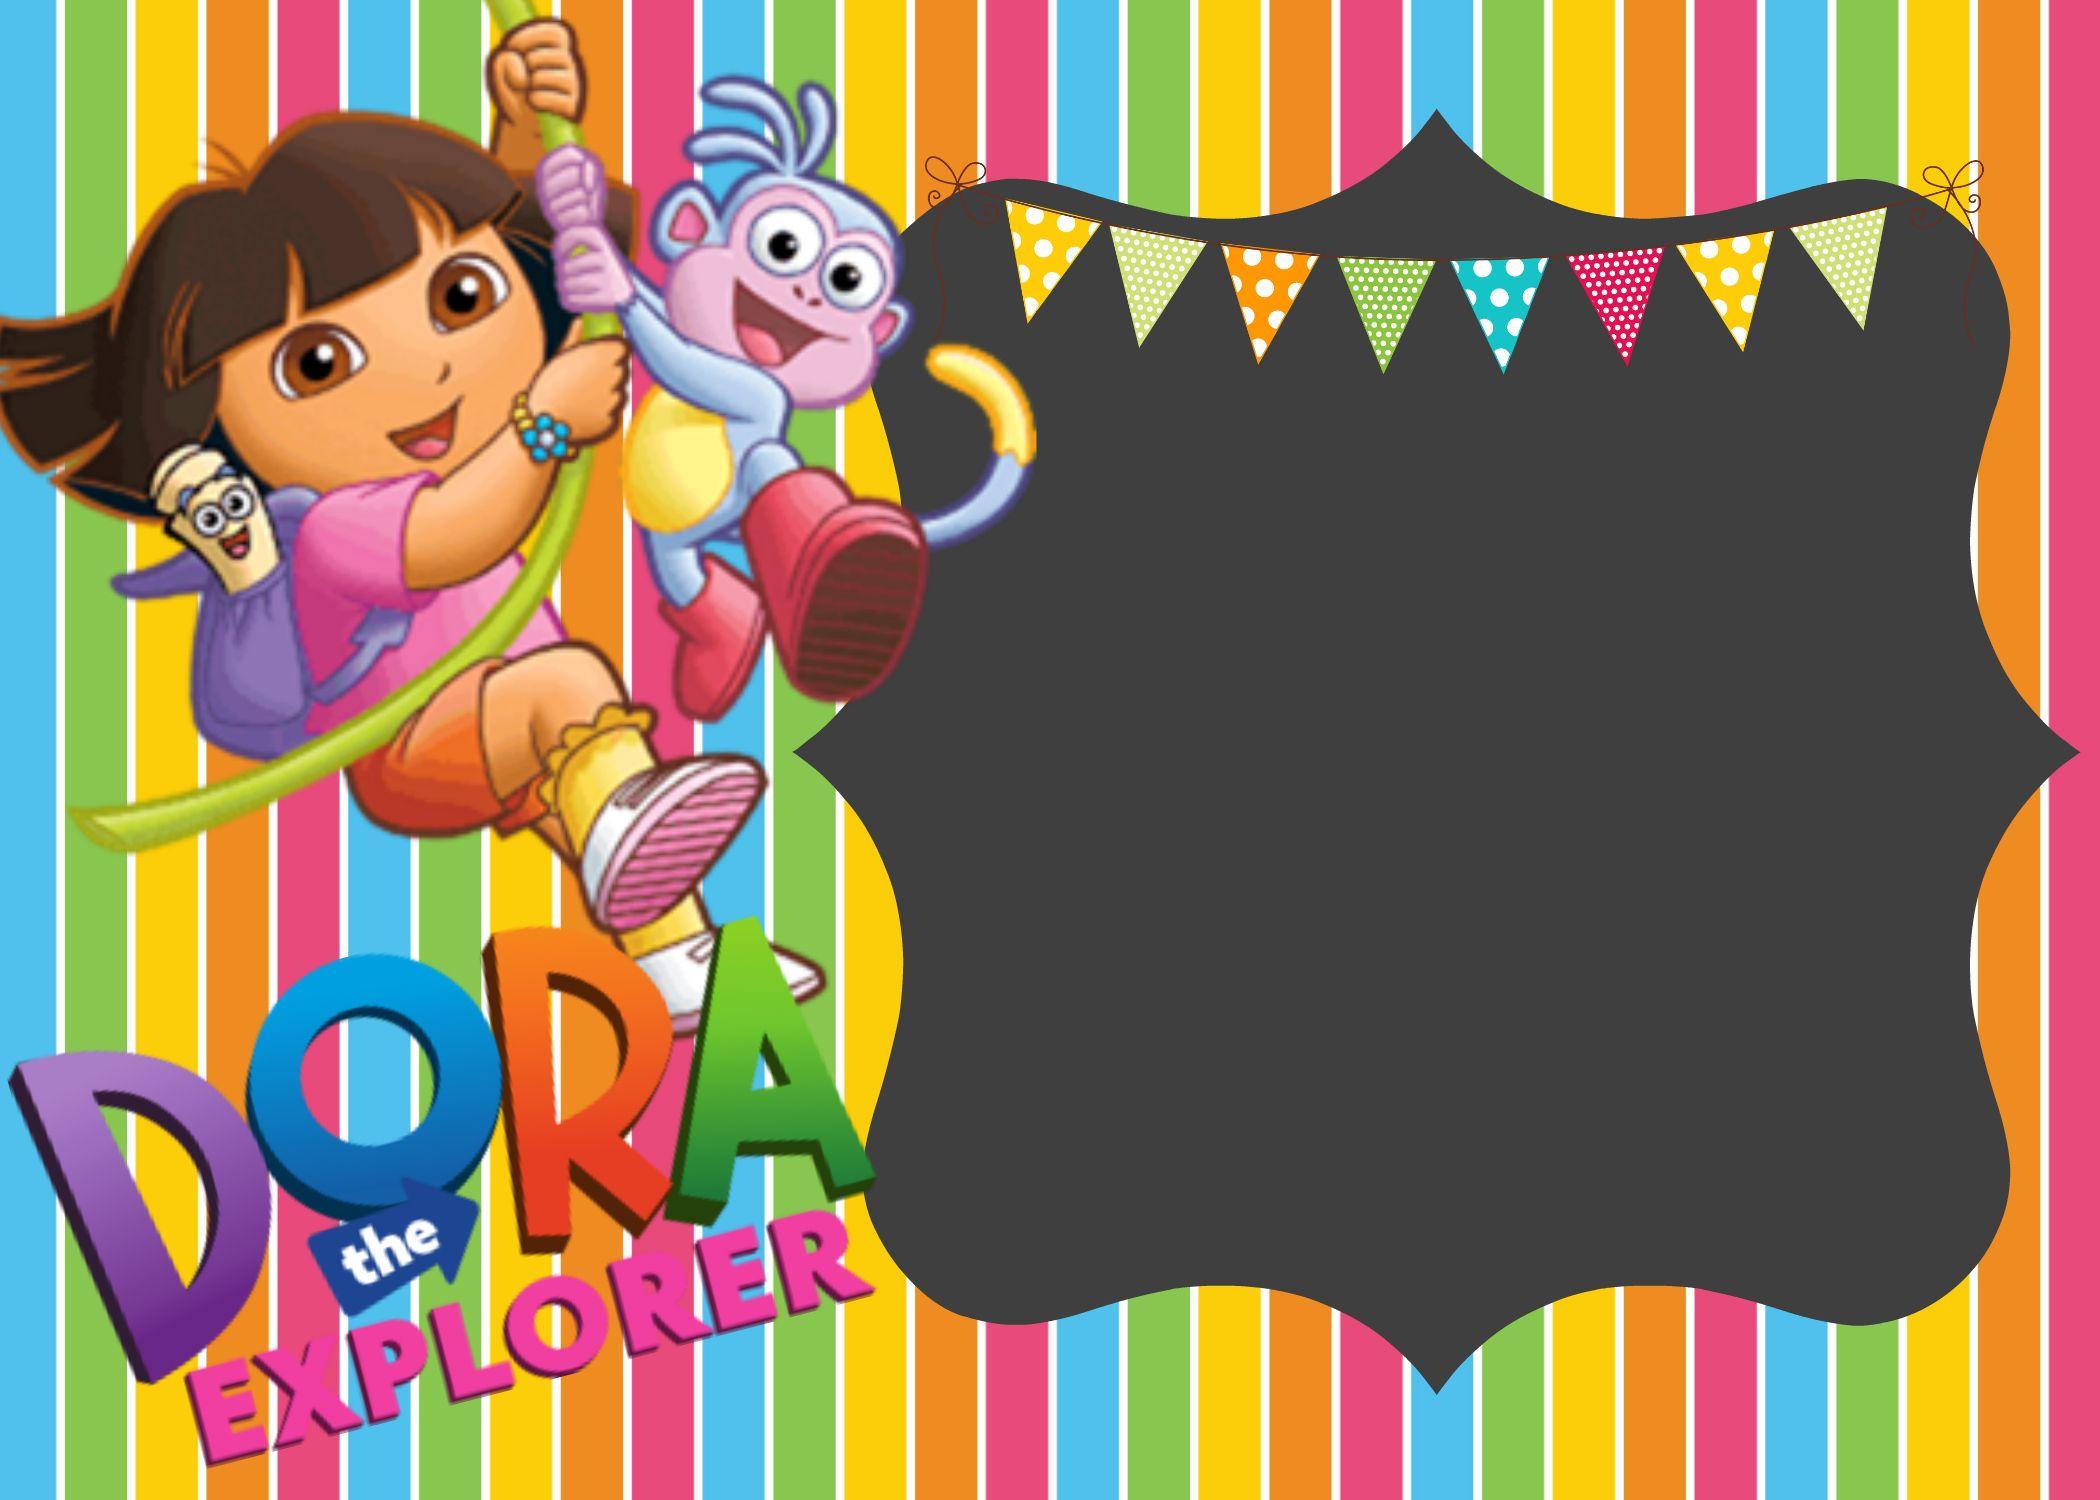 How To Make Dora The Explorer Digital Invitations Ellierosepartydesigns Com Explorer Birthday Party Kids Birthday Invitations Printable Kids Birthday Party Invitations